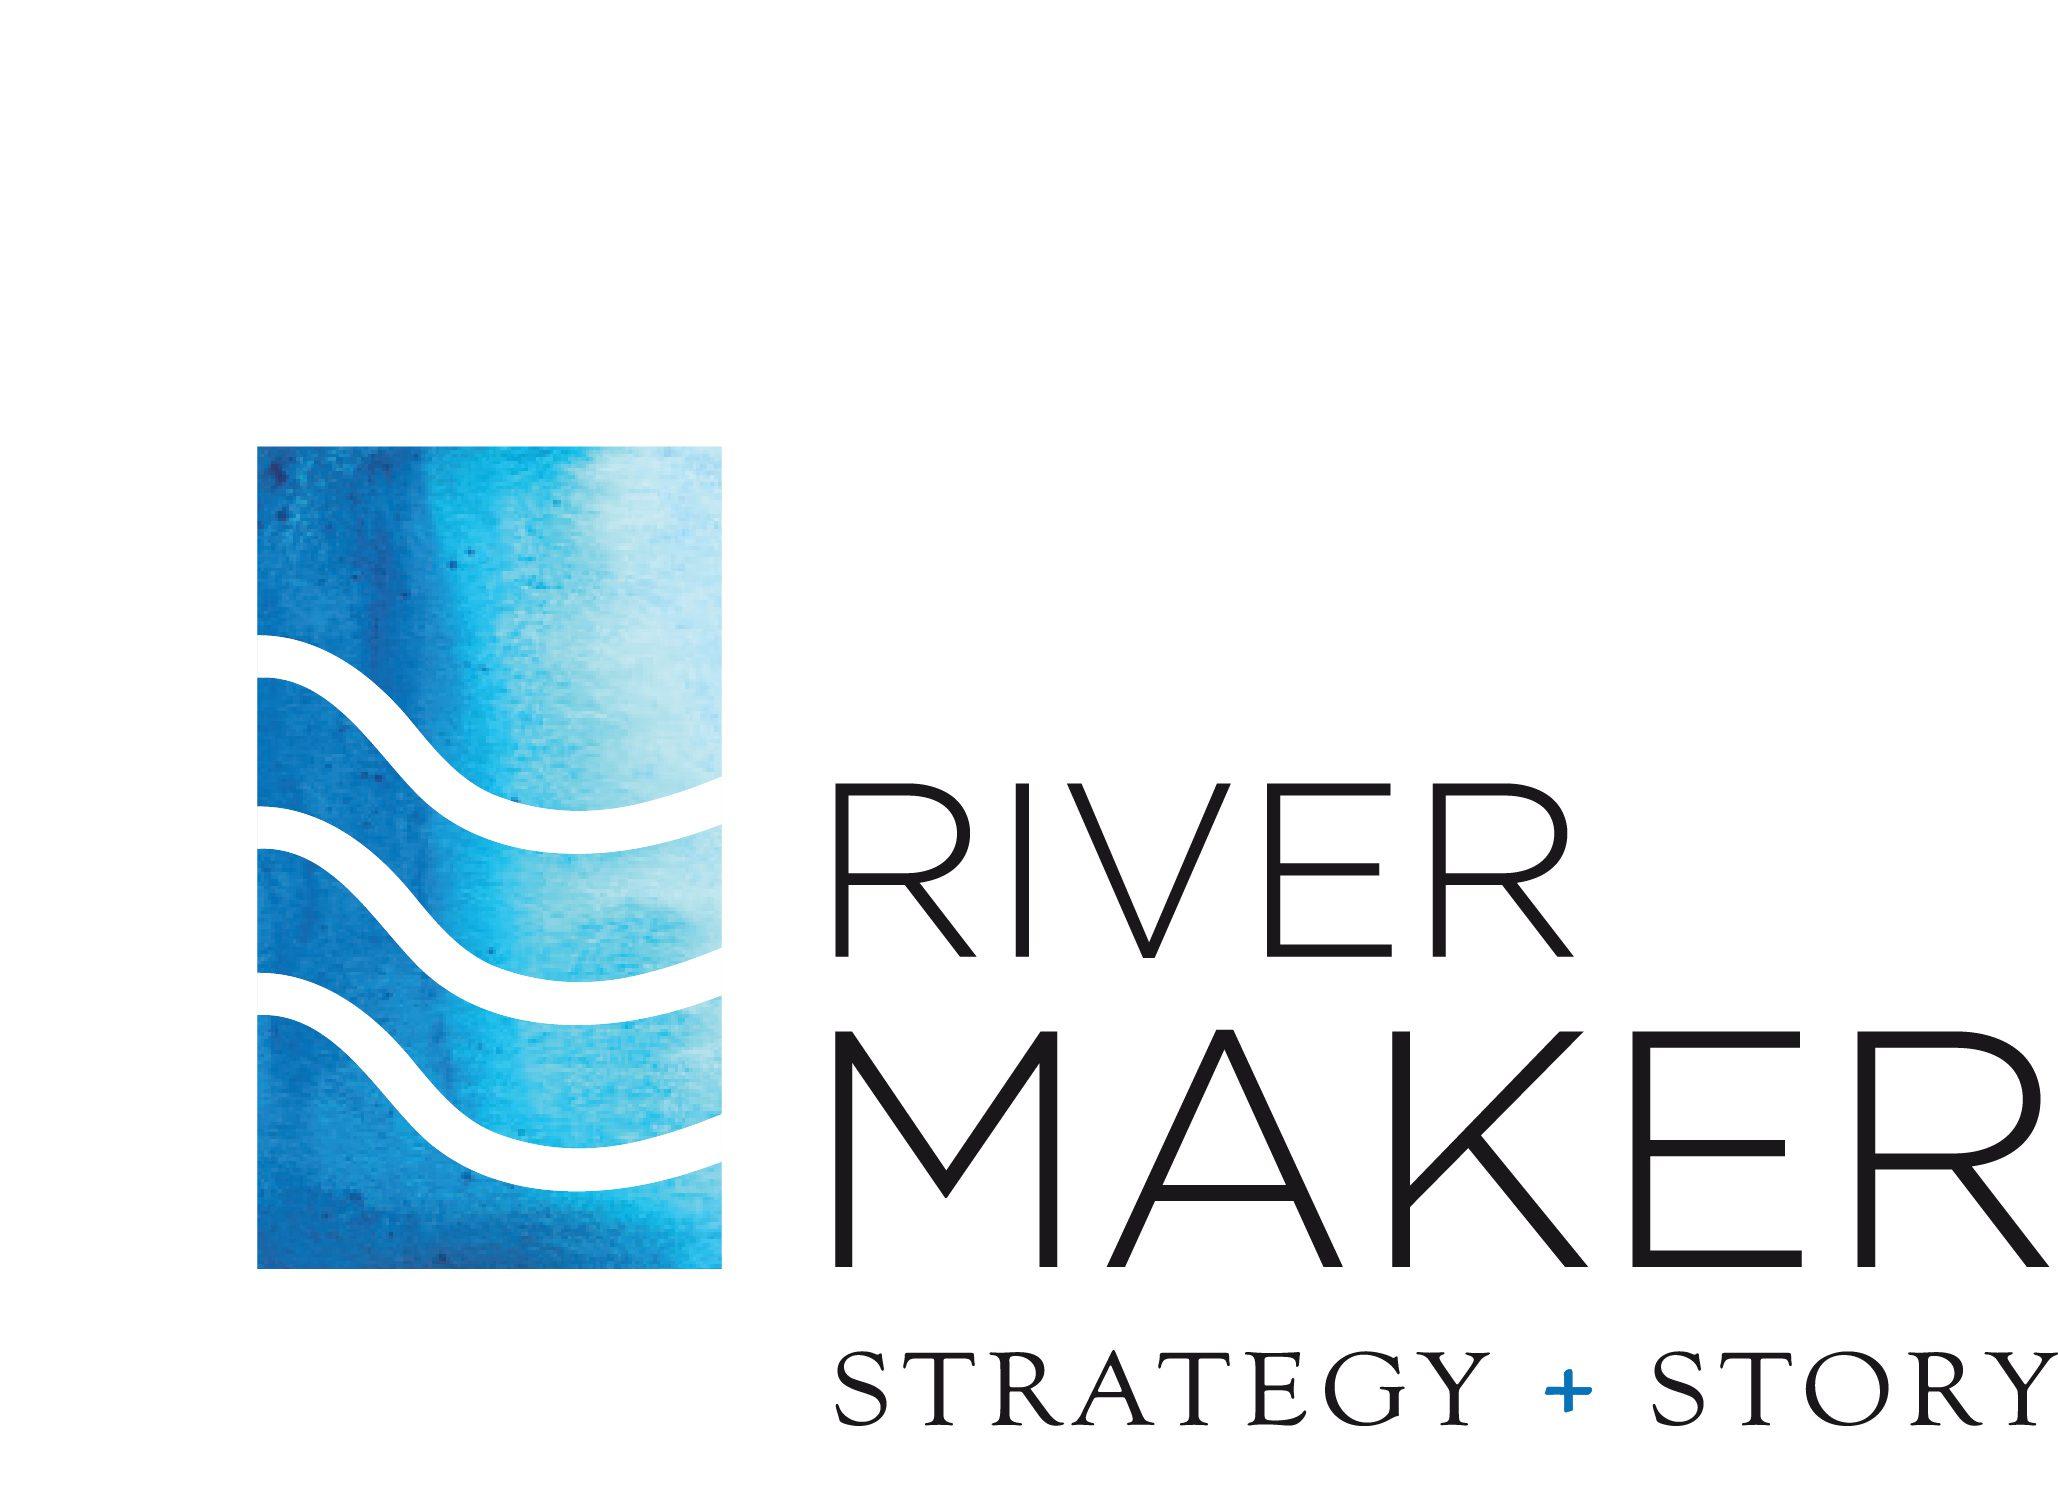 Rivermaker